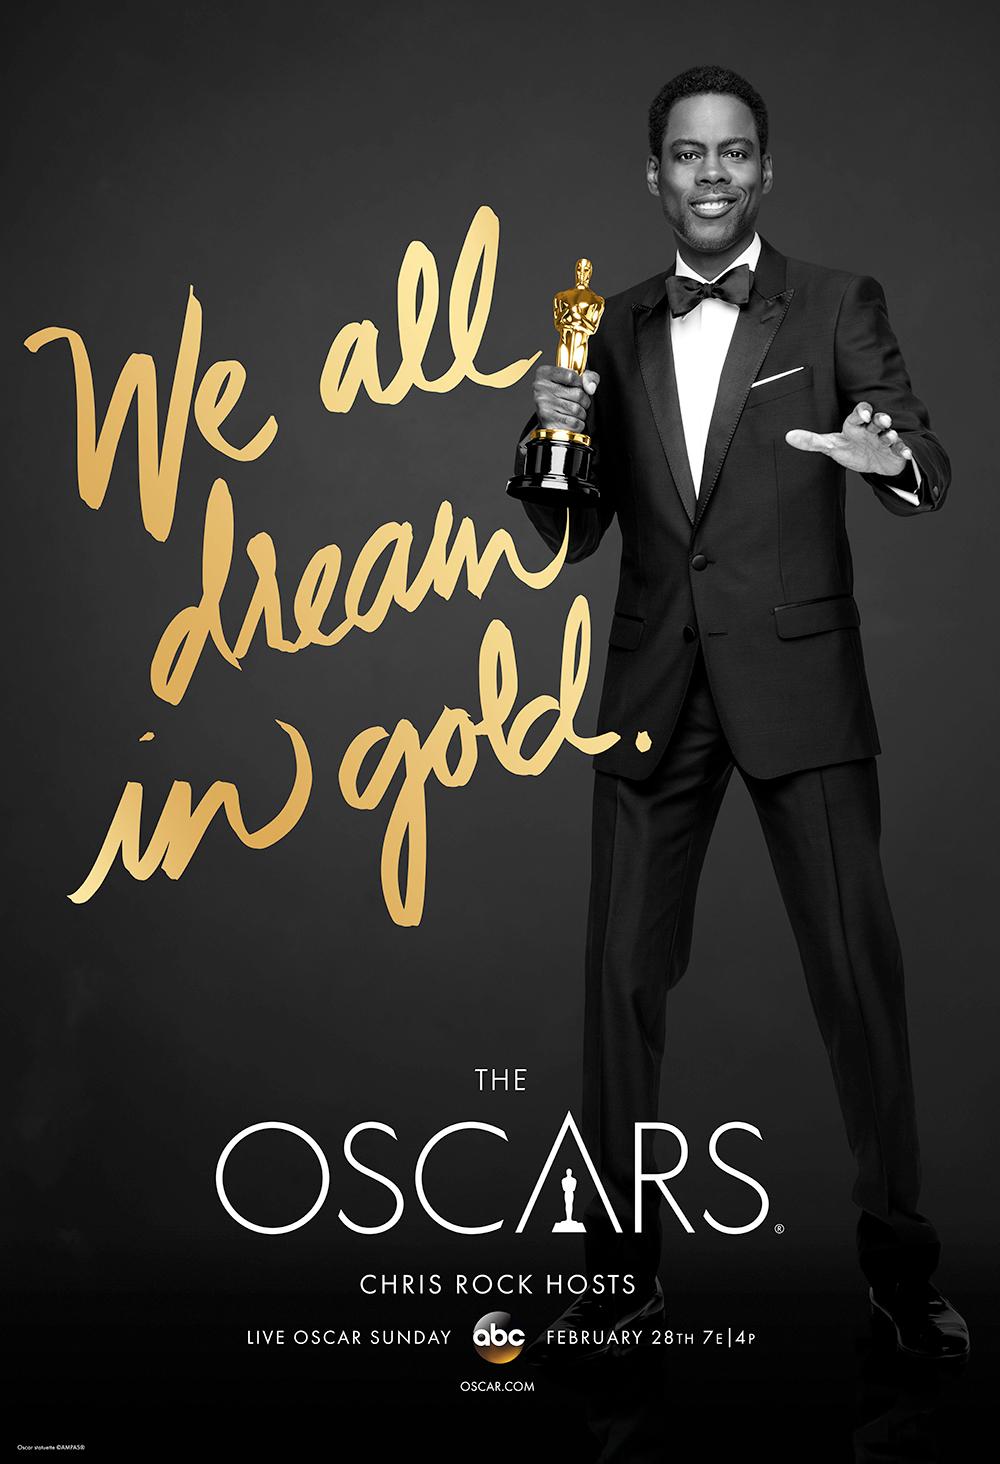 Oscars 2016 Poster